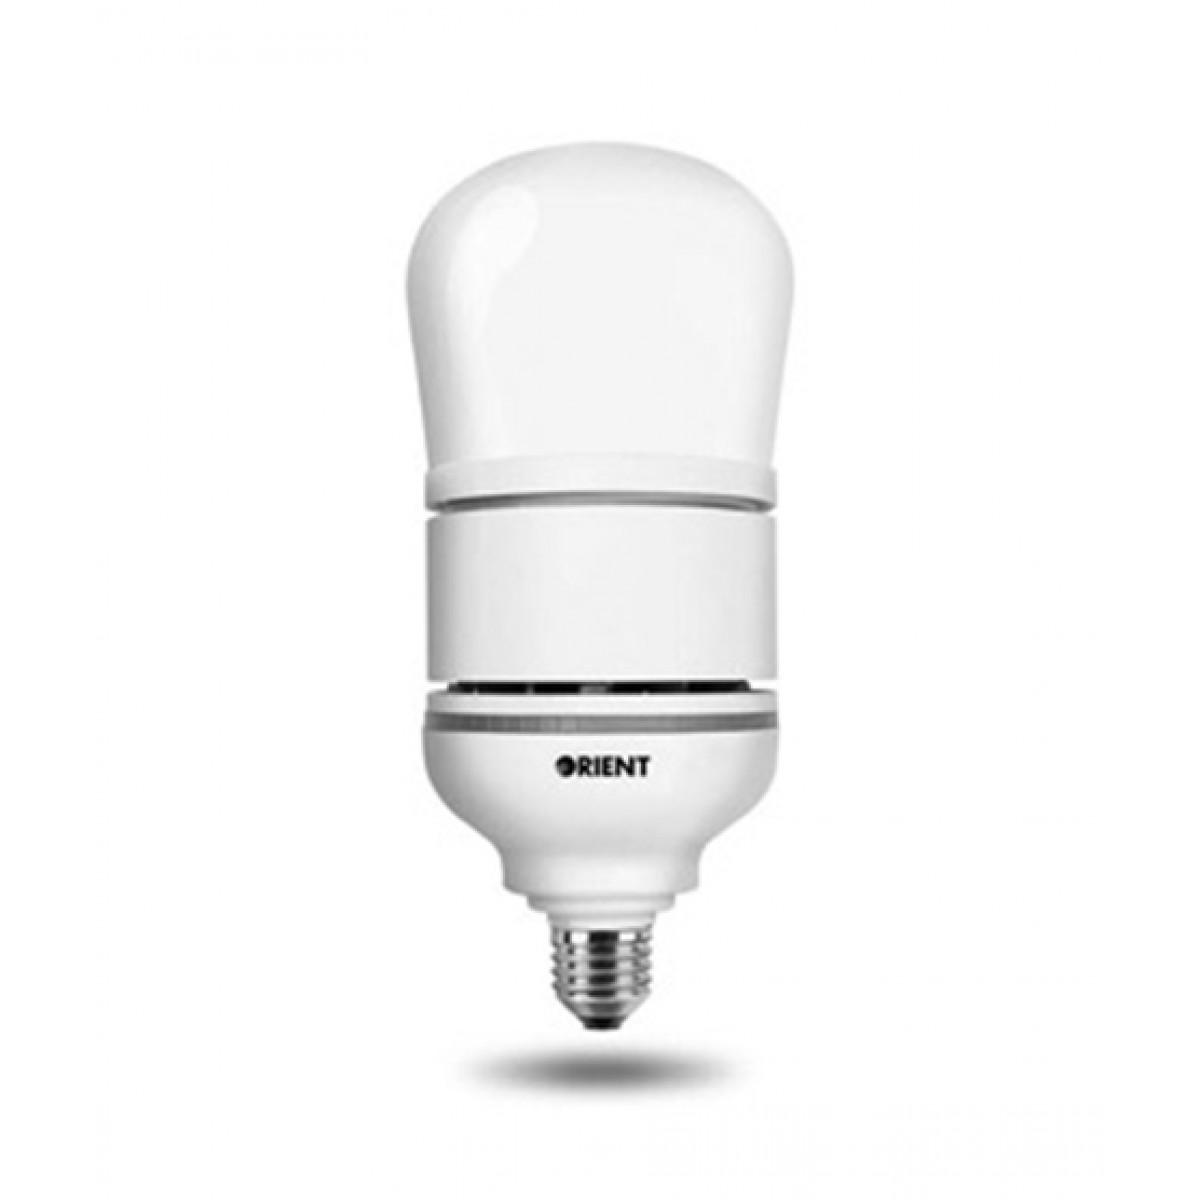 Orient 45 Watt Led Bulb Price In Pakistan Buy Orient 45 Watt Led Bulb Ishopping Pk